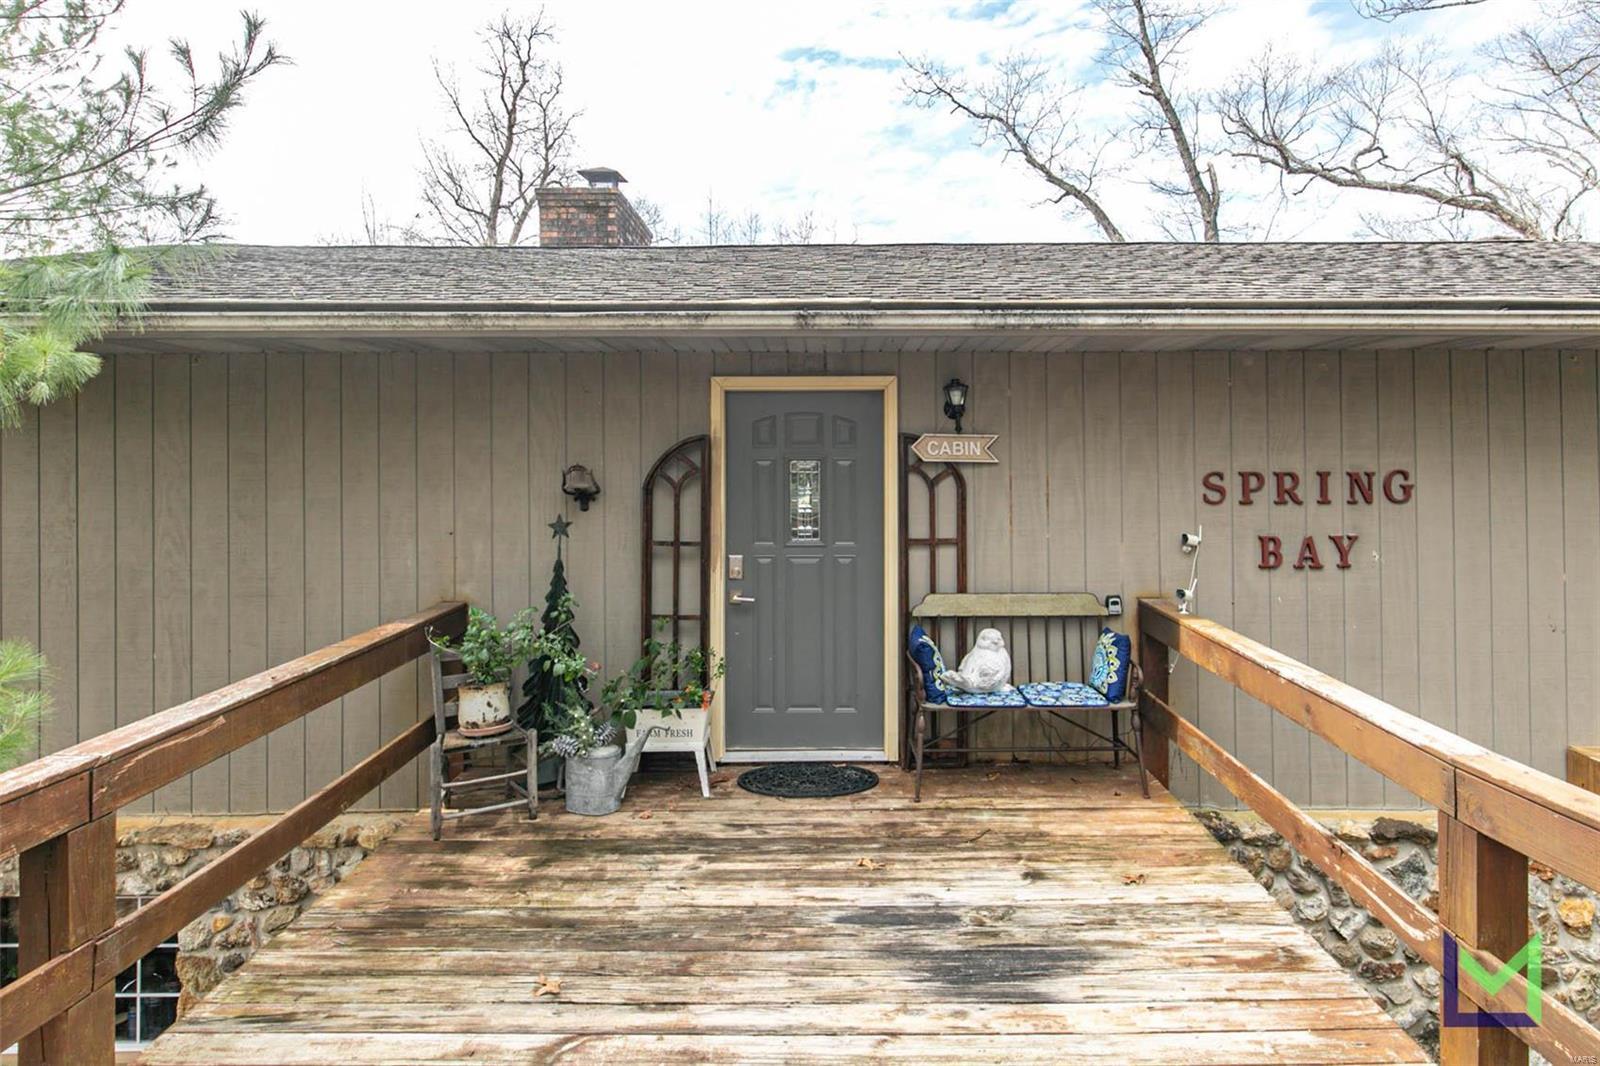 63 S Spring Bay Lane Property Photo - Doniphan, MO real estate listing